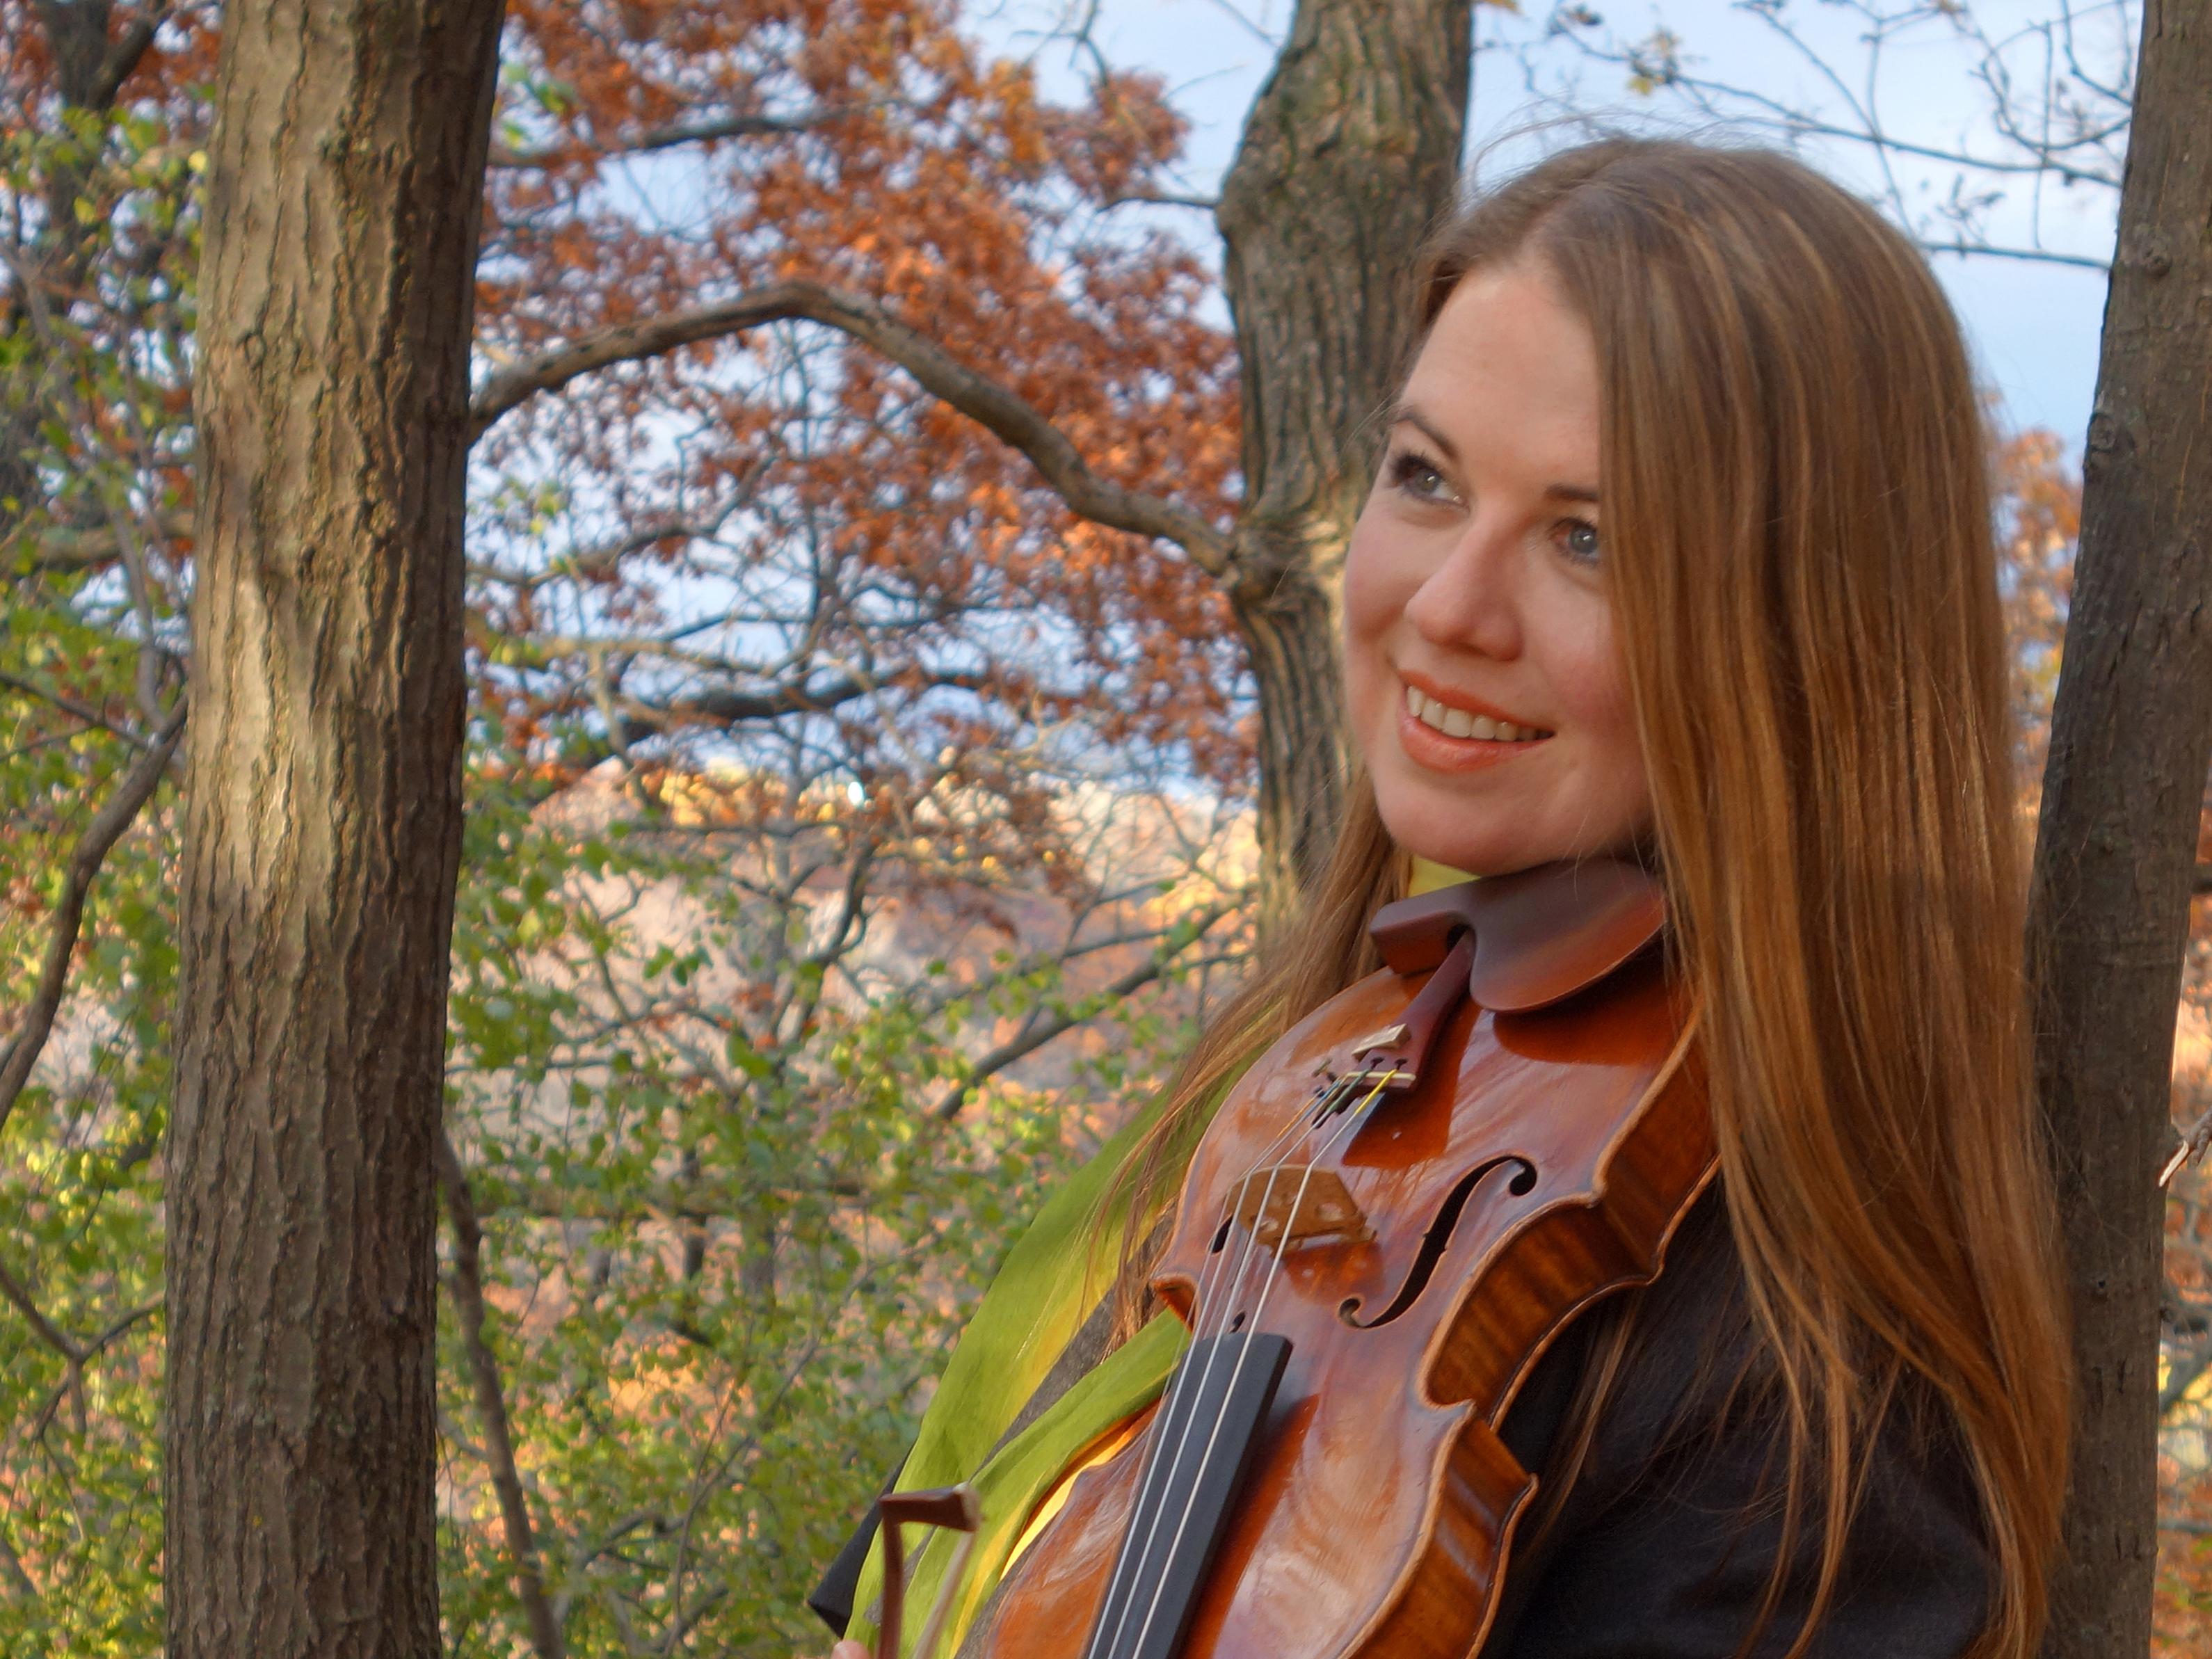 Npr Best Music 2021 Violinist Lara St. John Vindicated By Curtis Institute Sex Abuse